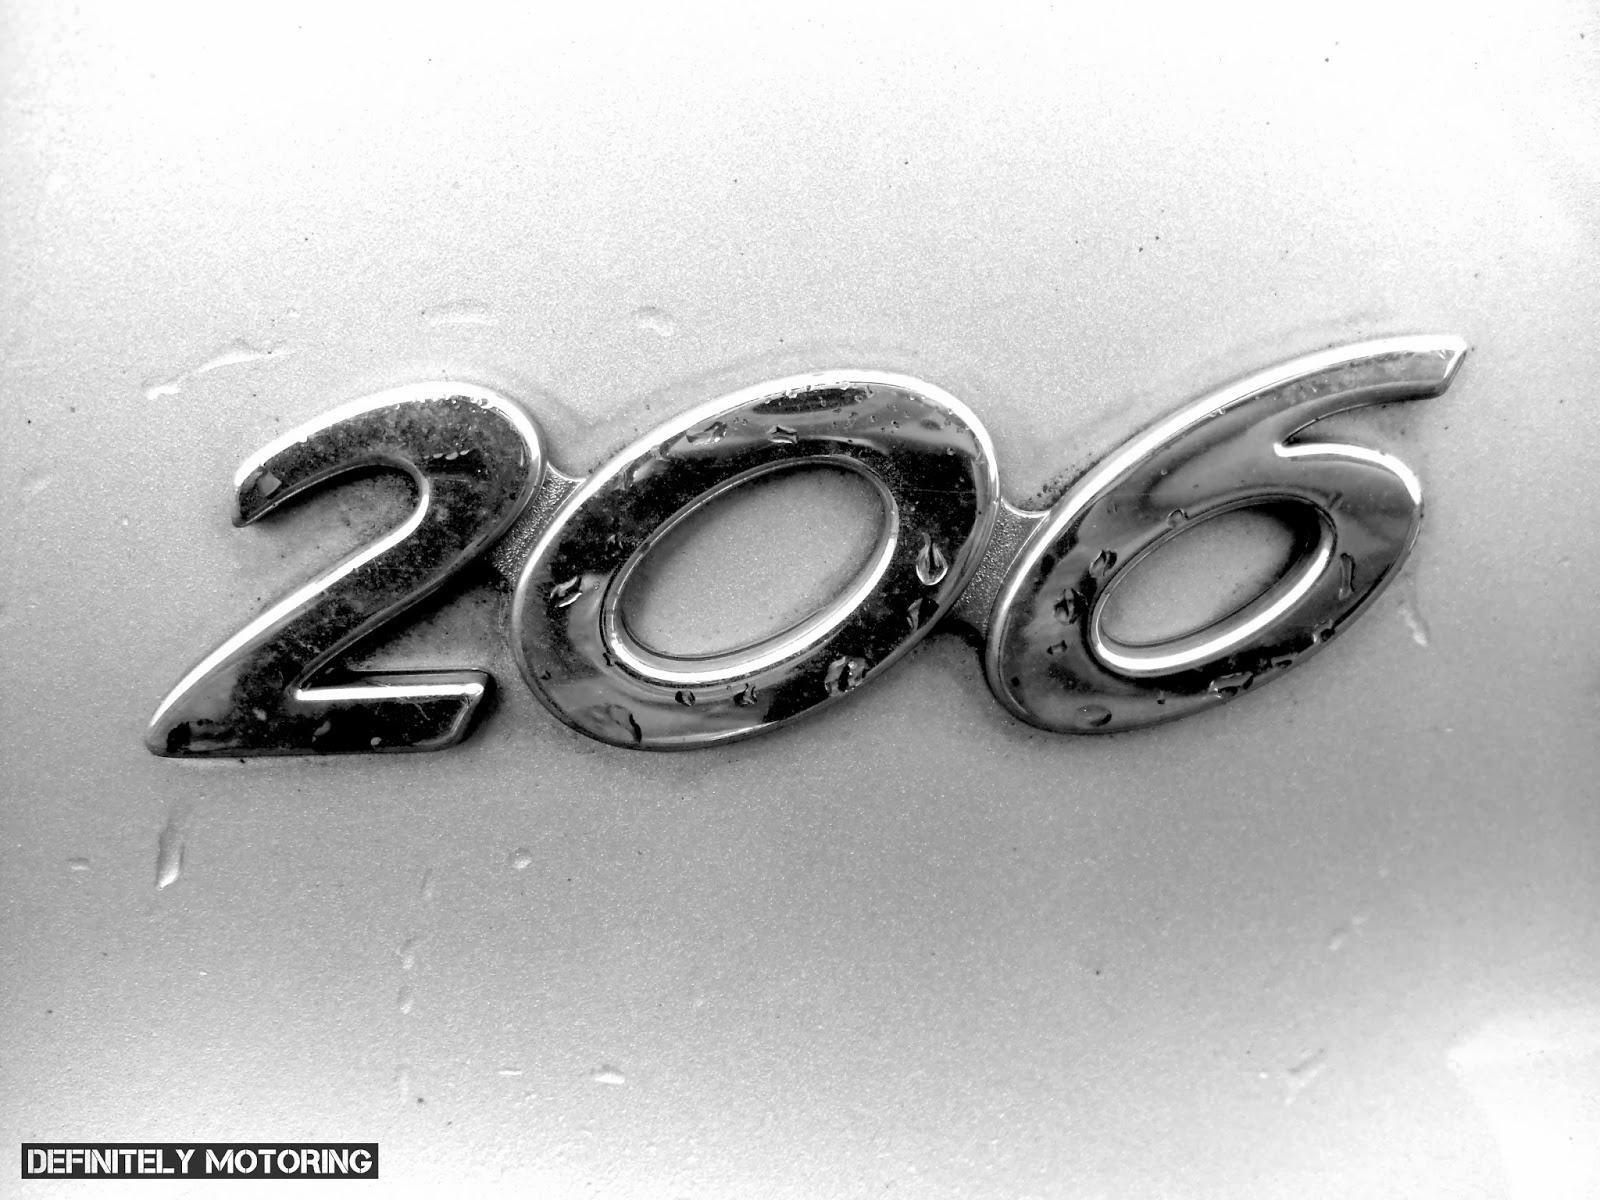 Definitely Motoring: DRIVEN: Peugeot 206